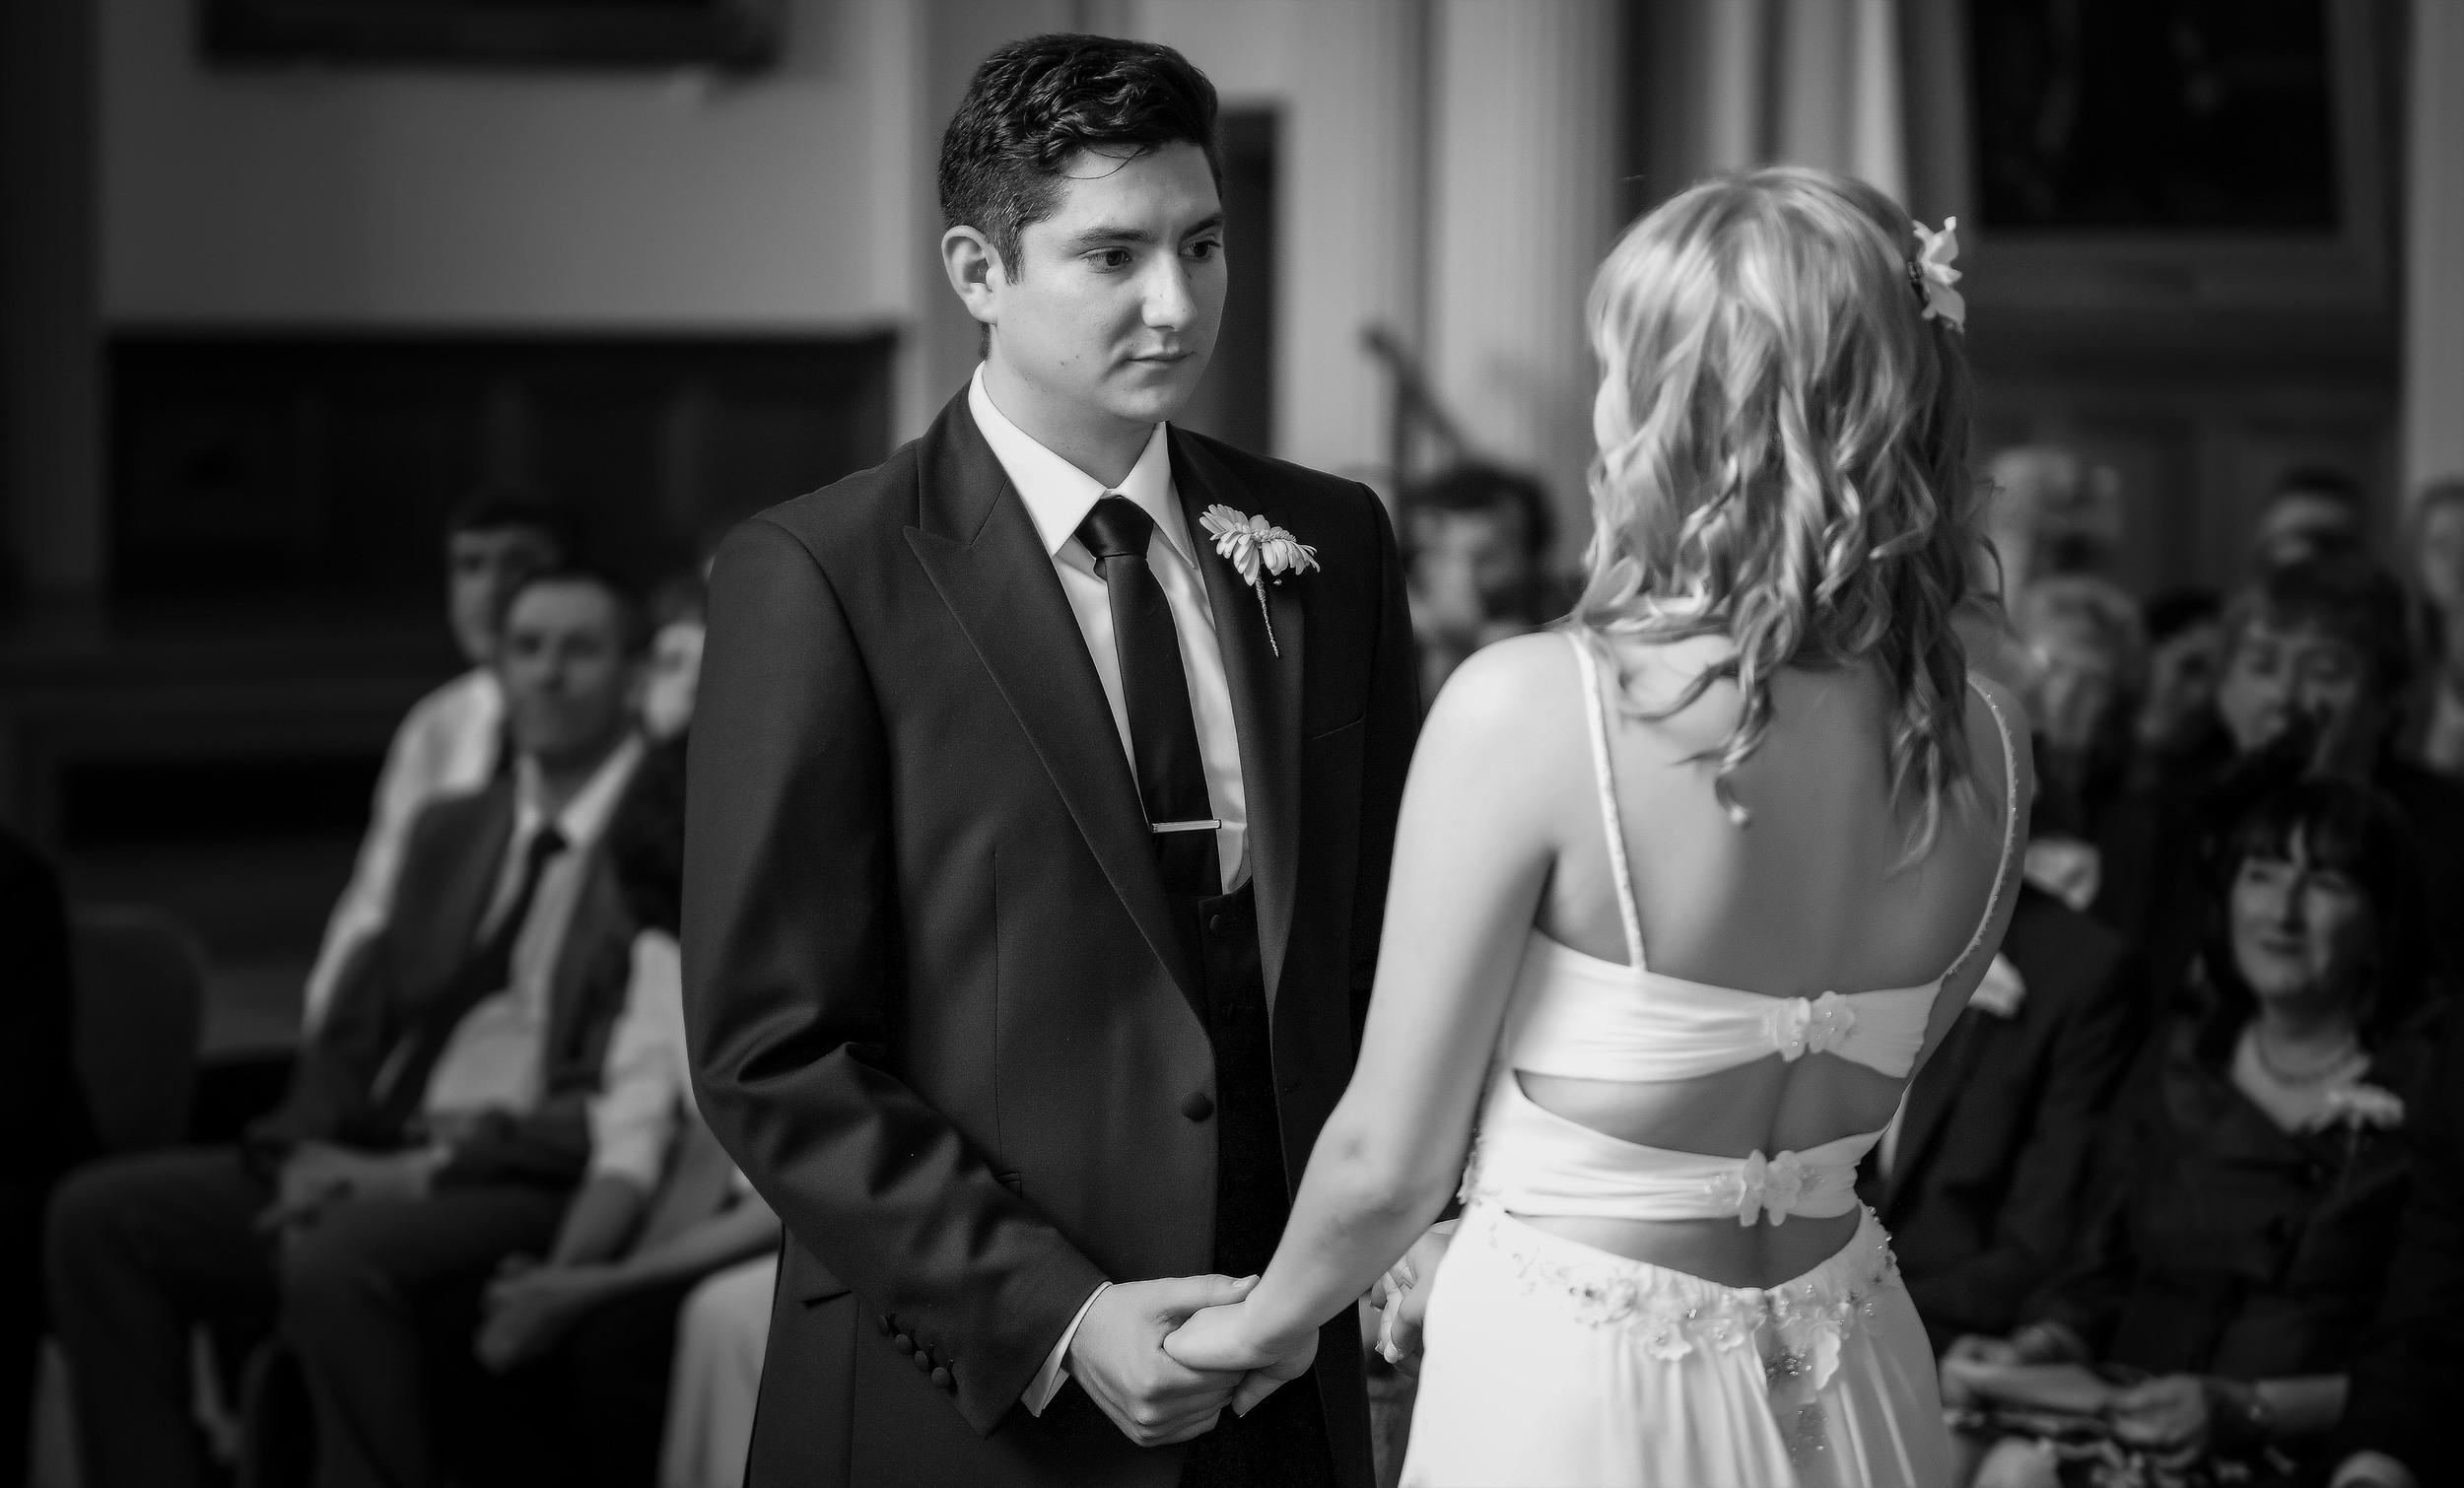 colchester-wedding-vows-aisle-london-uk-destination-wedding-photography-Adam-Rowley